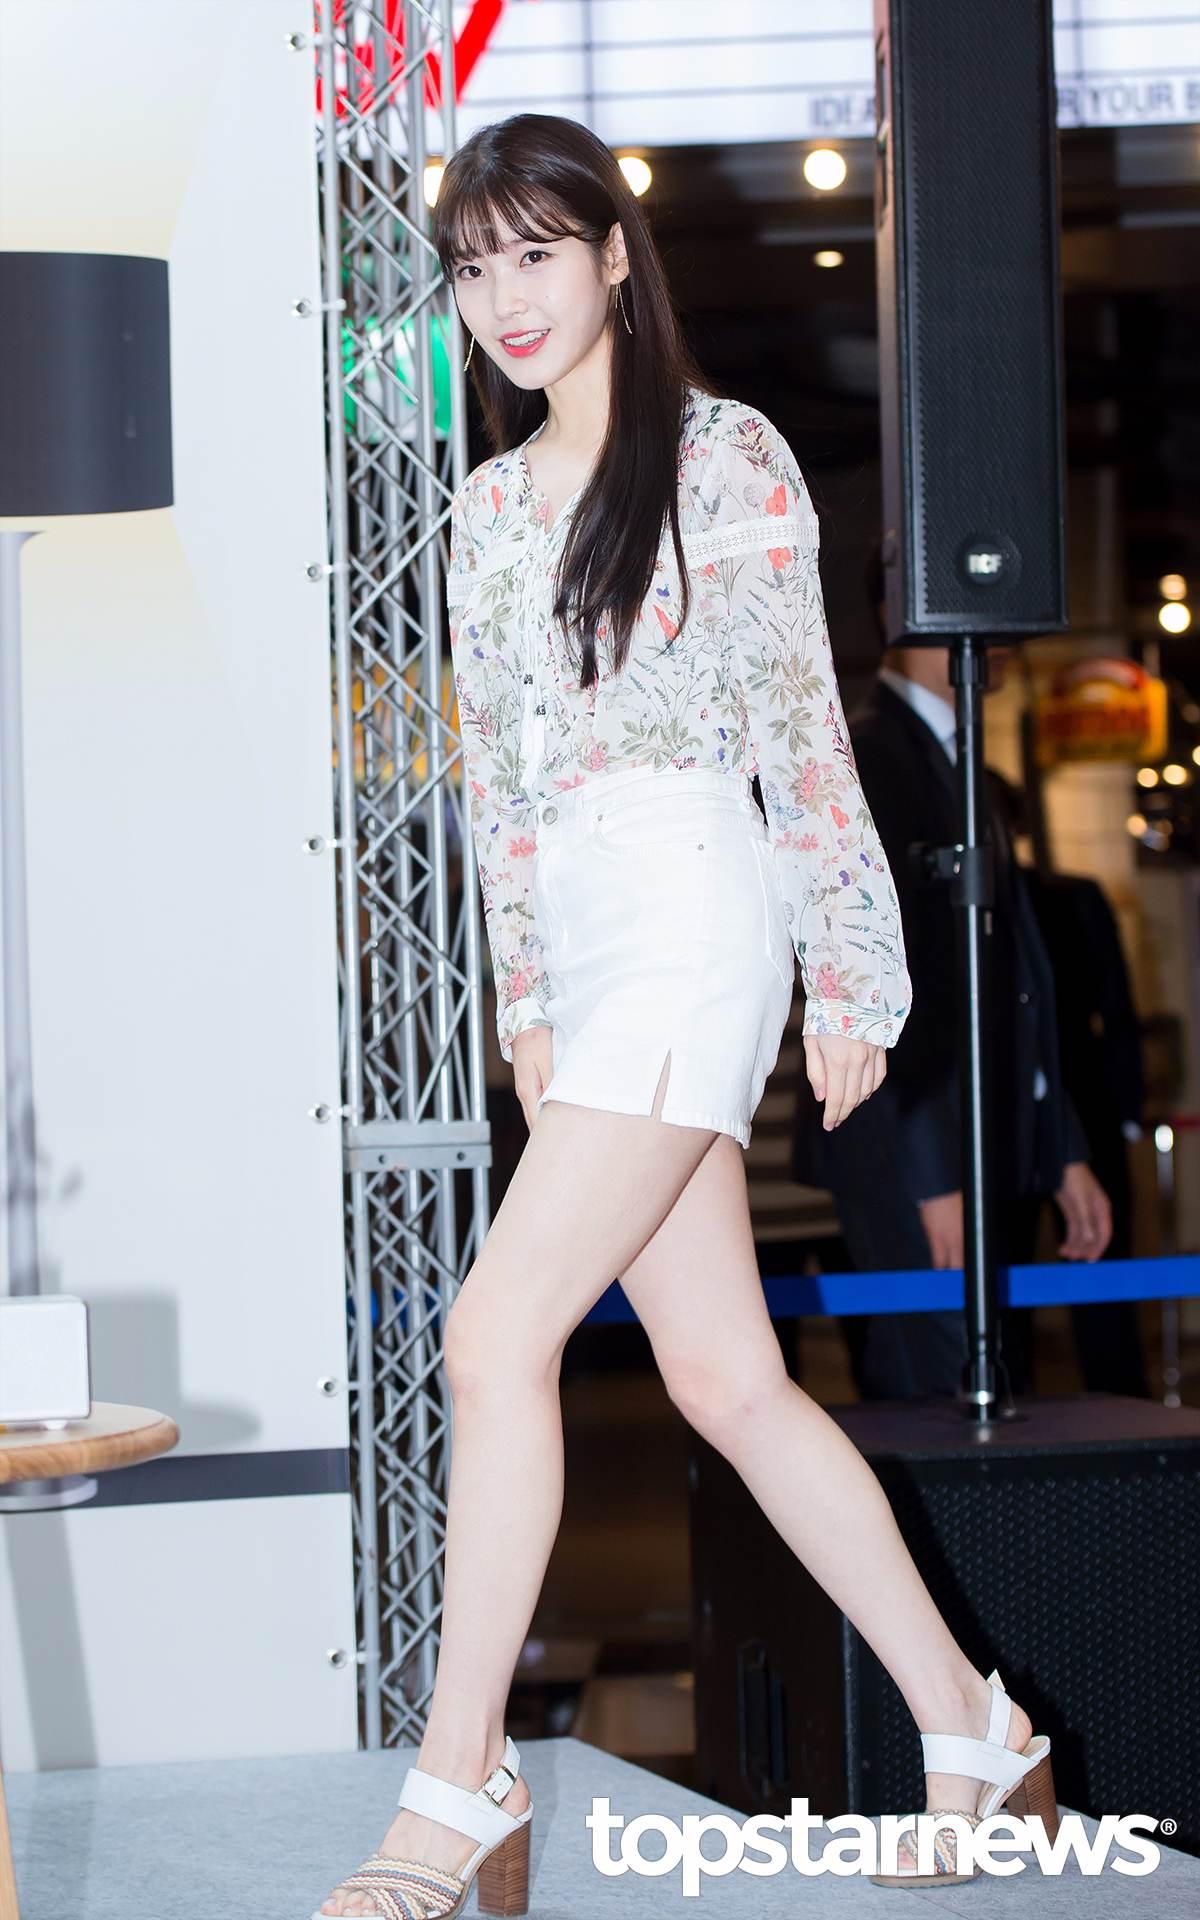 IU用加入了花朵印花圖案的民族風襯衫搭配白色迷你短裙,輕鬆地完成了一套夏季時尚穿搭,小清新中帶一點點性感魅力~